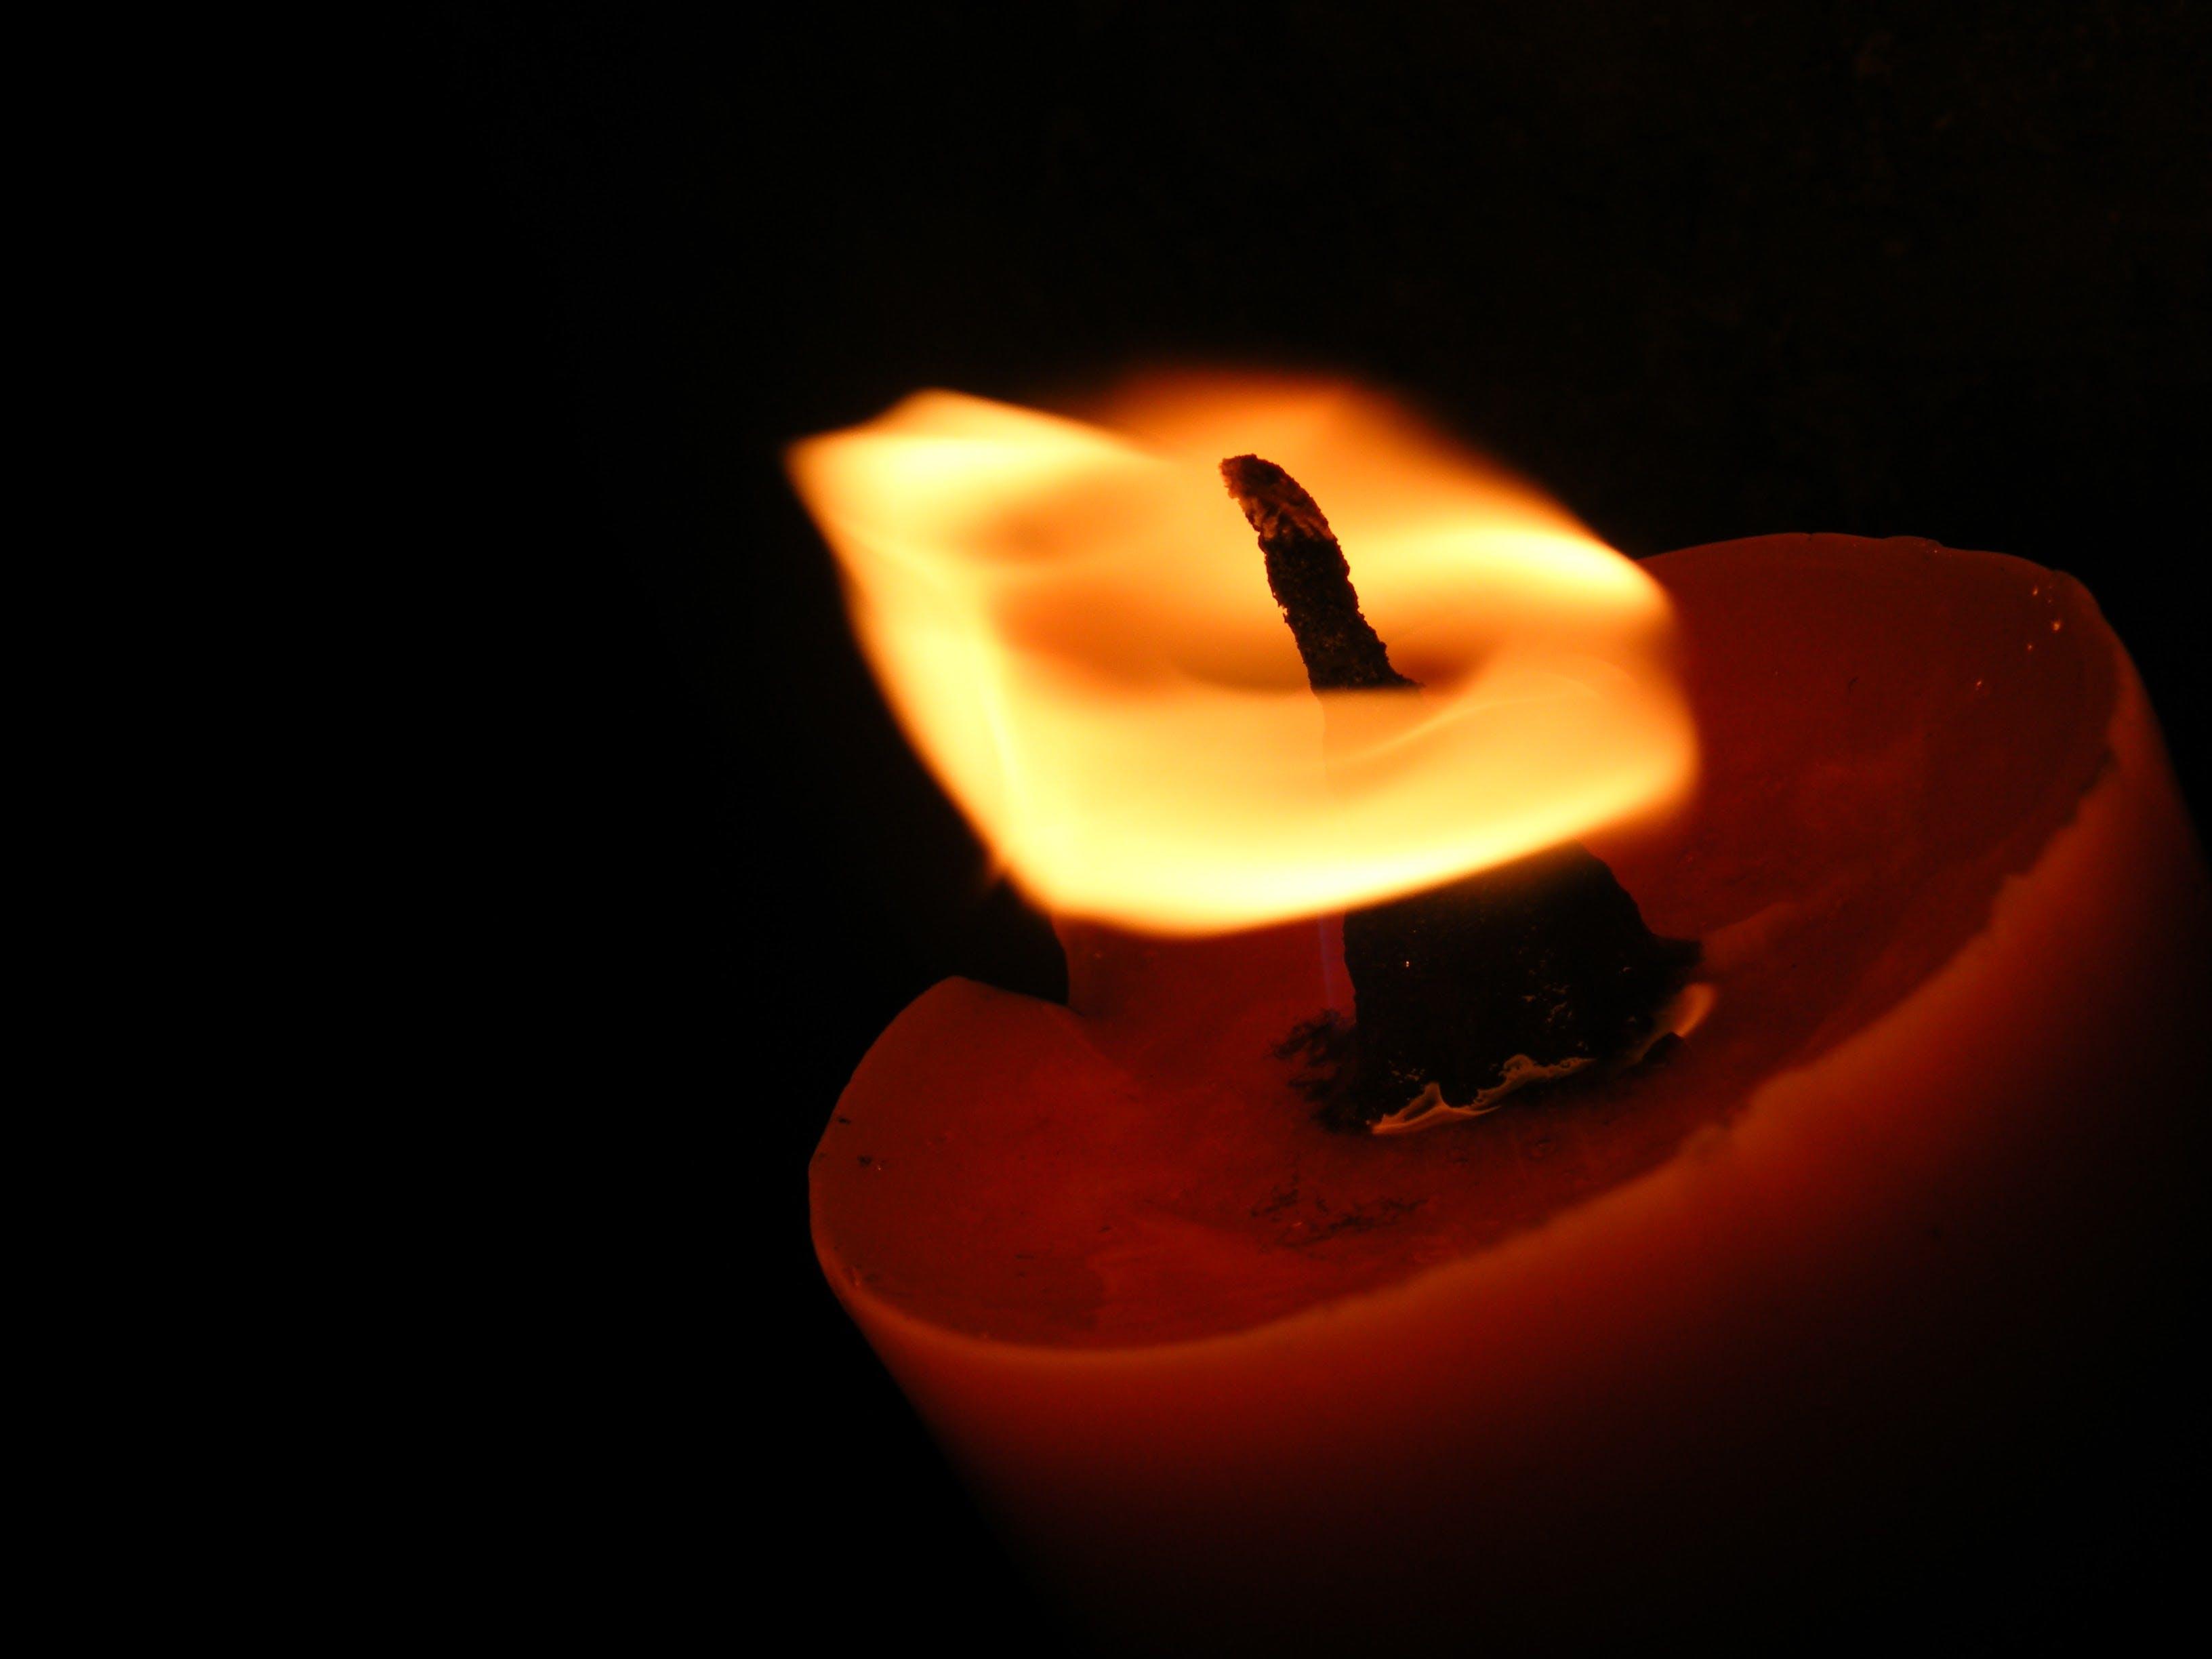 candle, hope, light